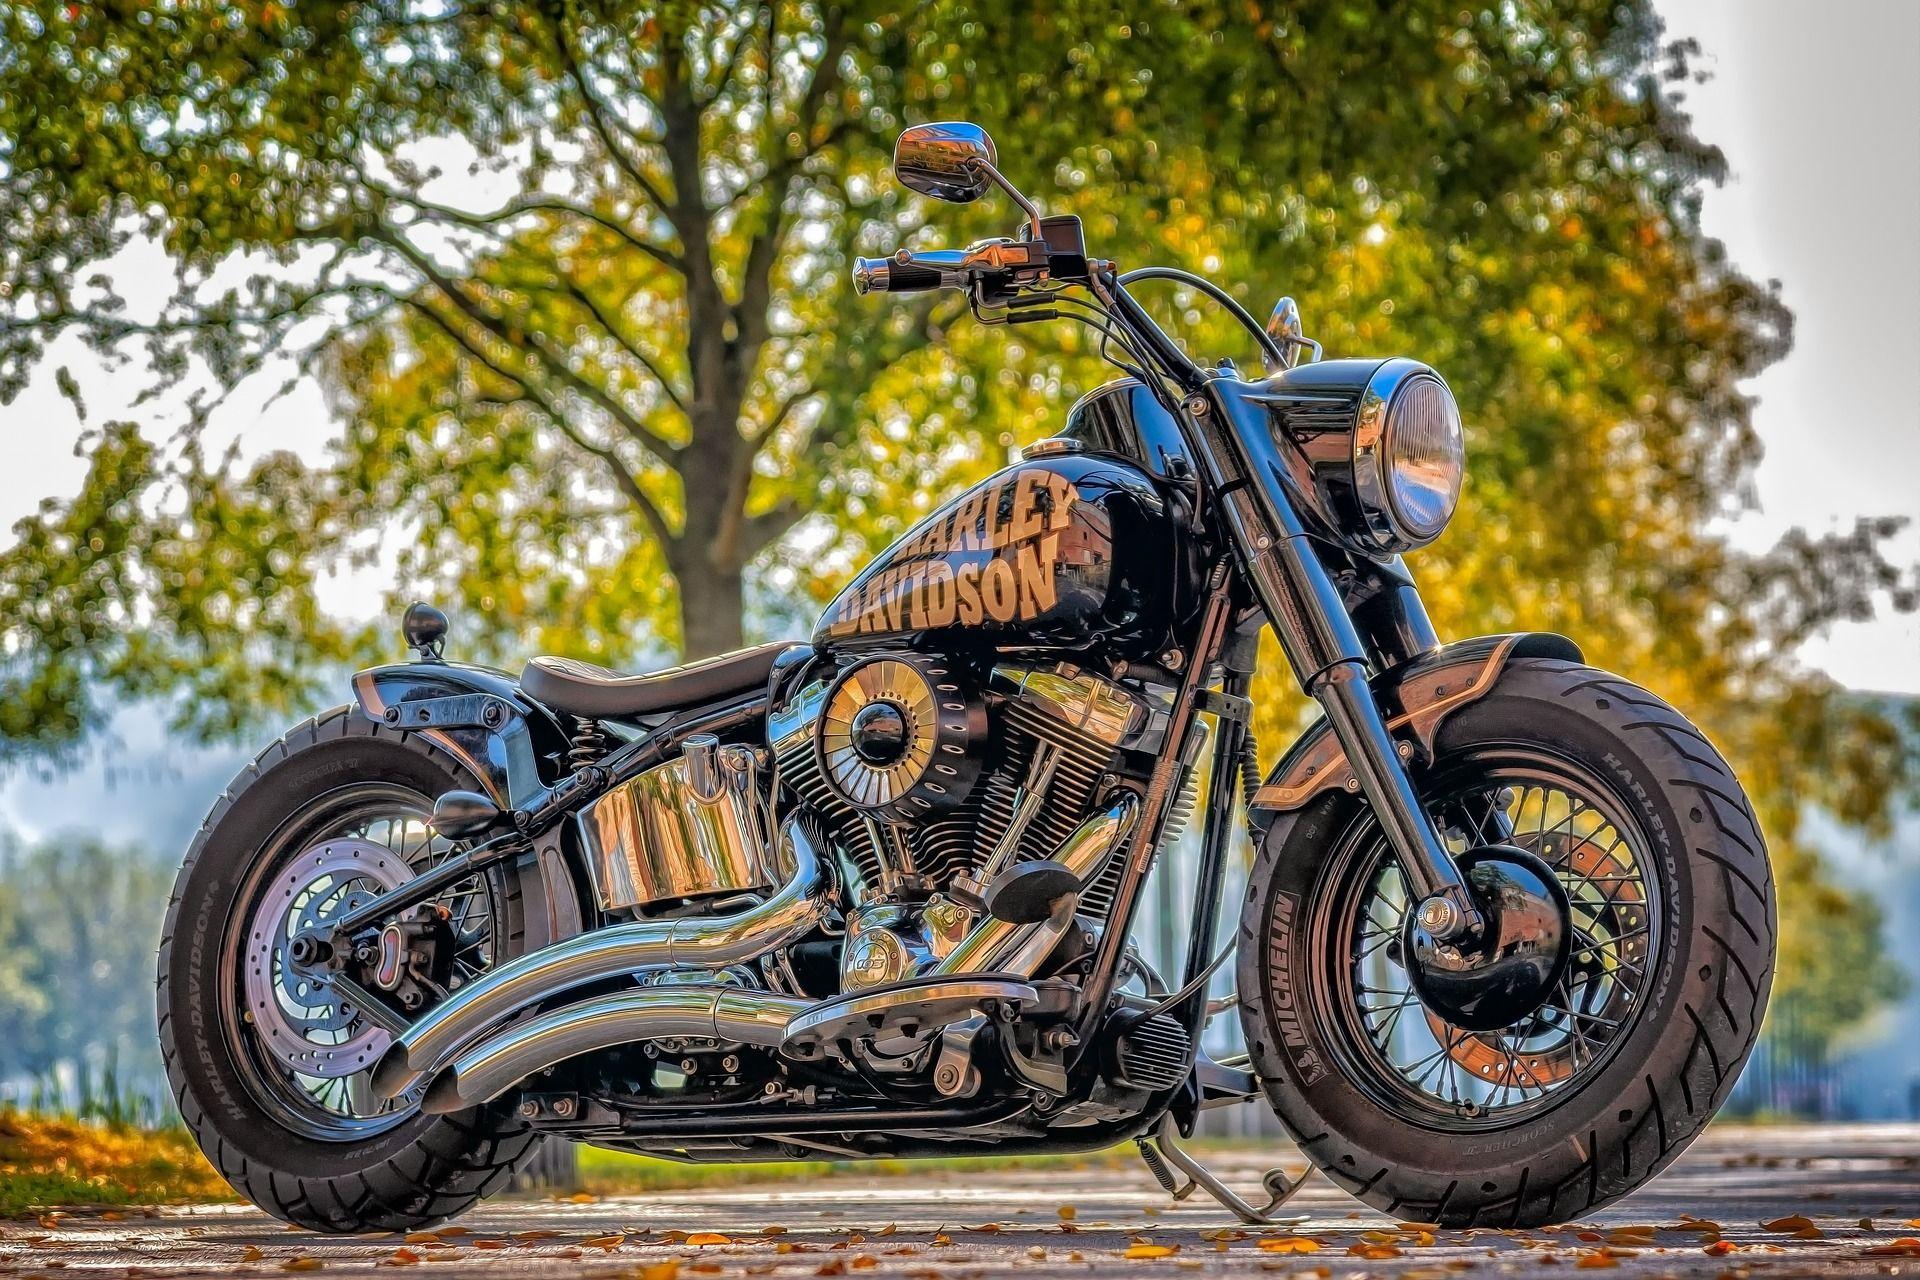 Wallpaper Harley Davidson Motorcycle Side View 3840x2160